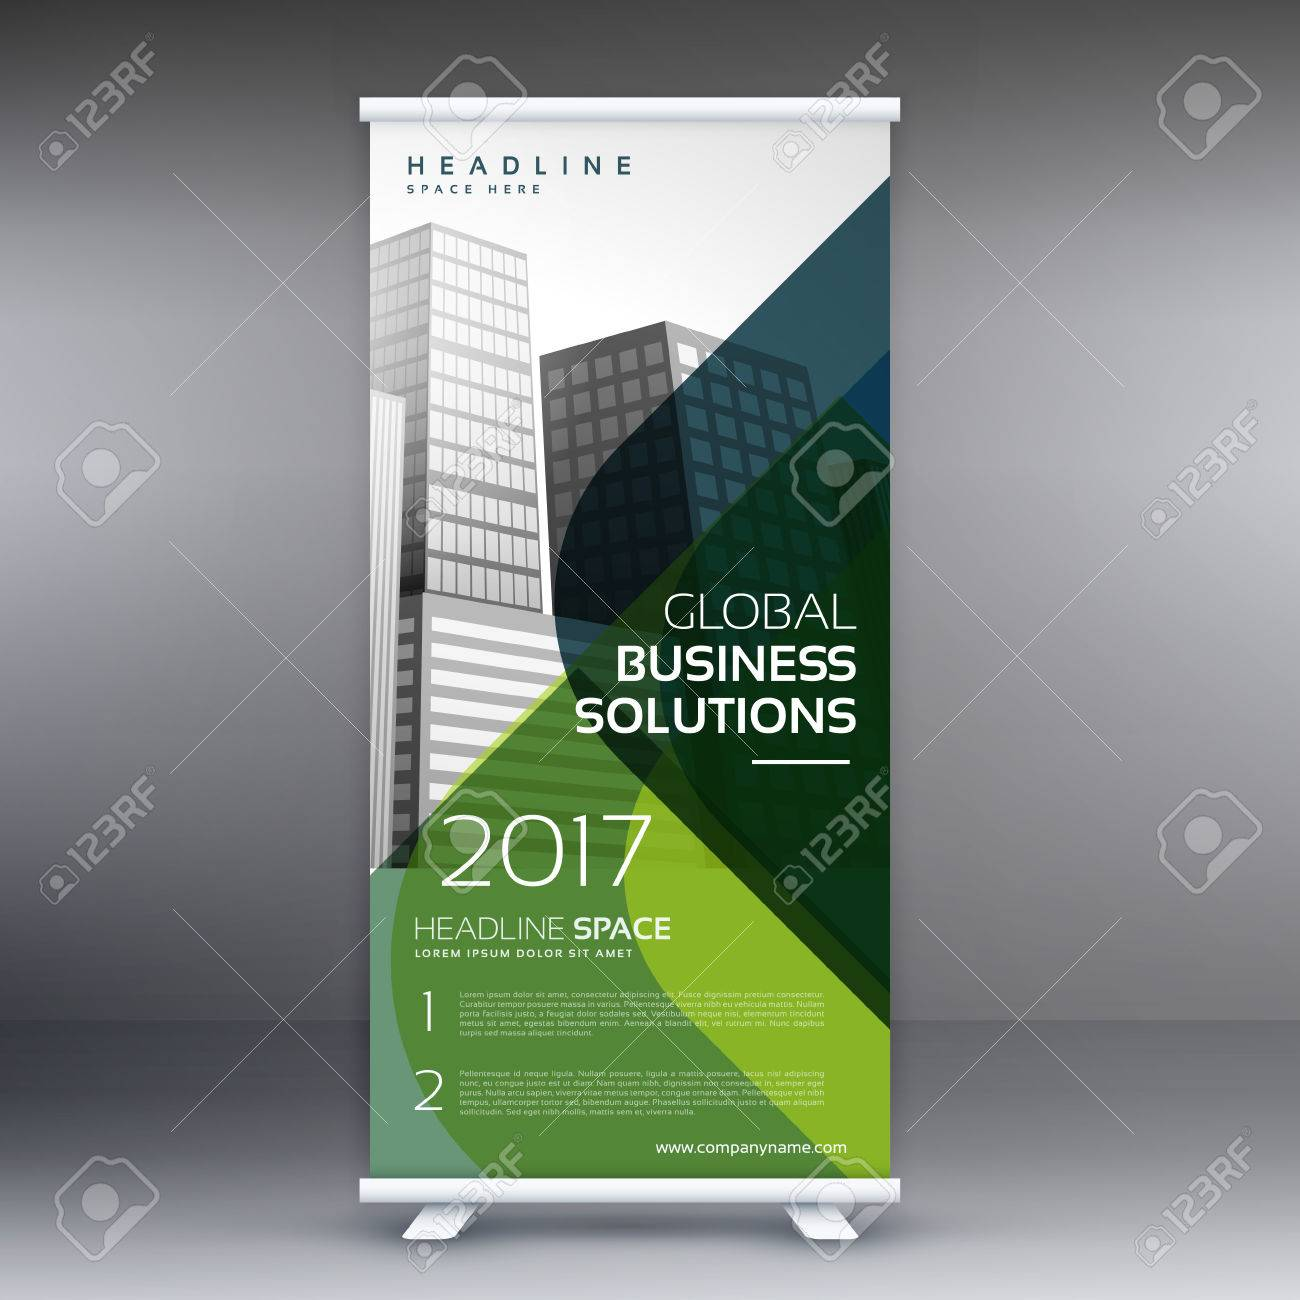 Creative Standee Rol Up Display Banner Vector Template Design ...